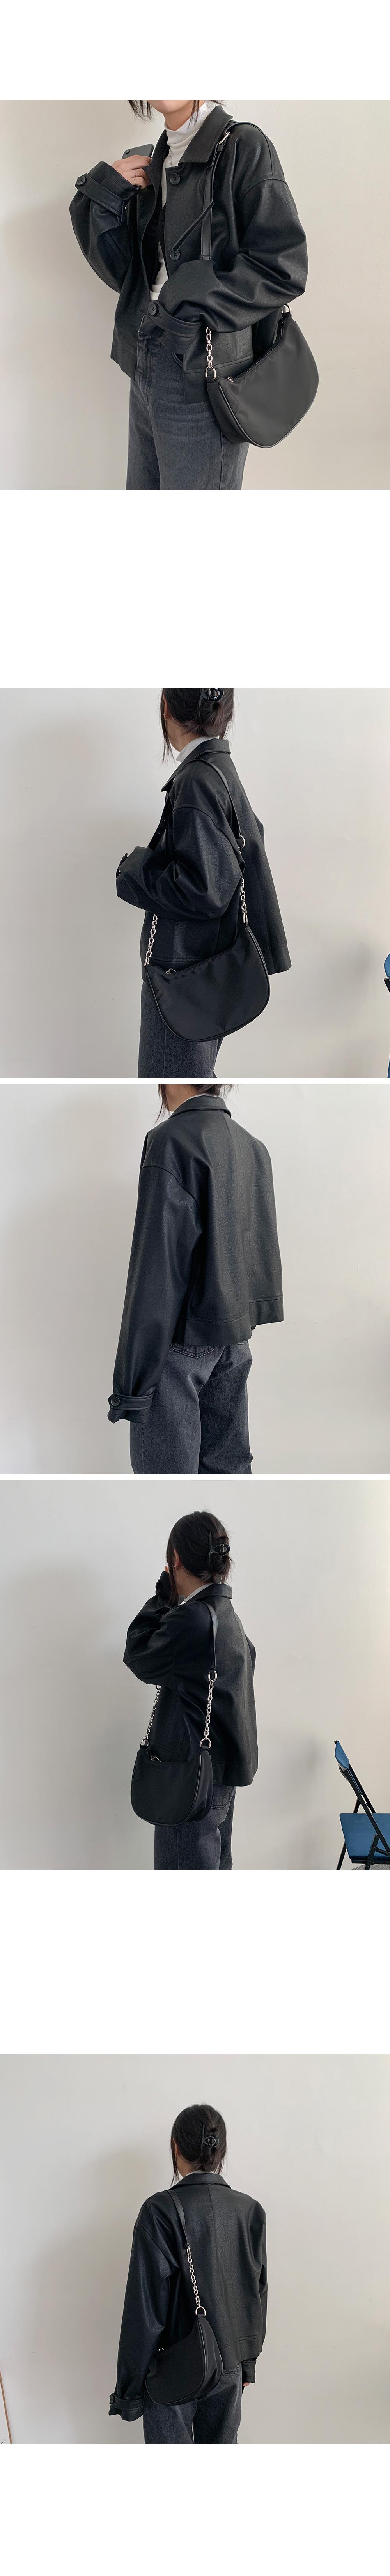 Classic Black Leather Jacket